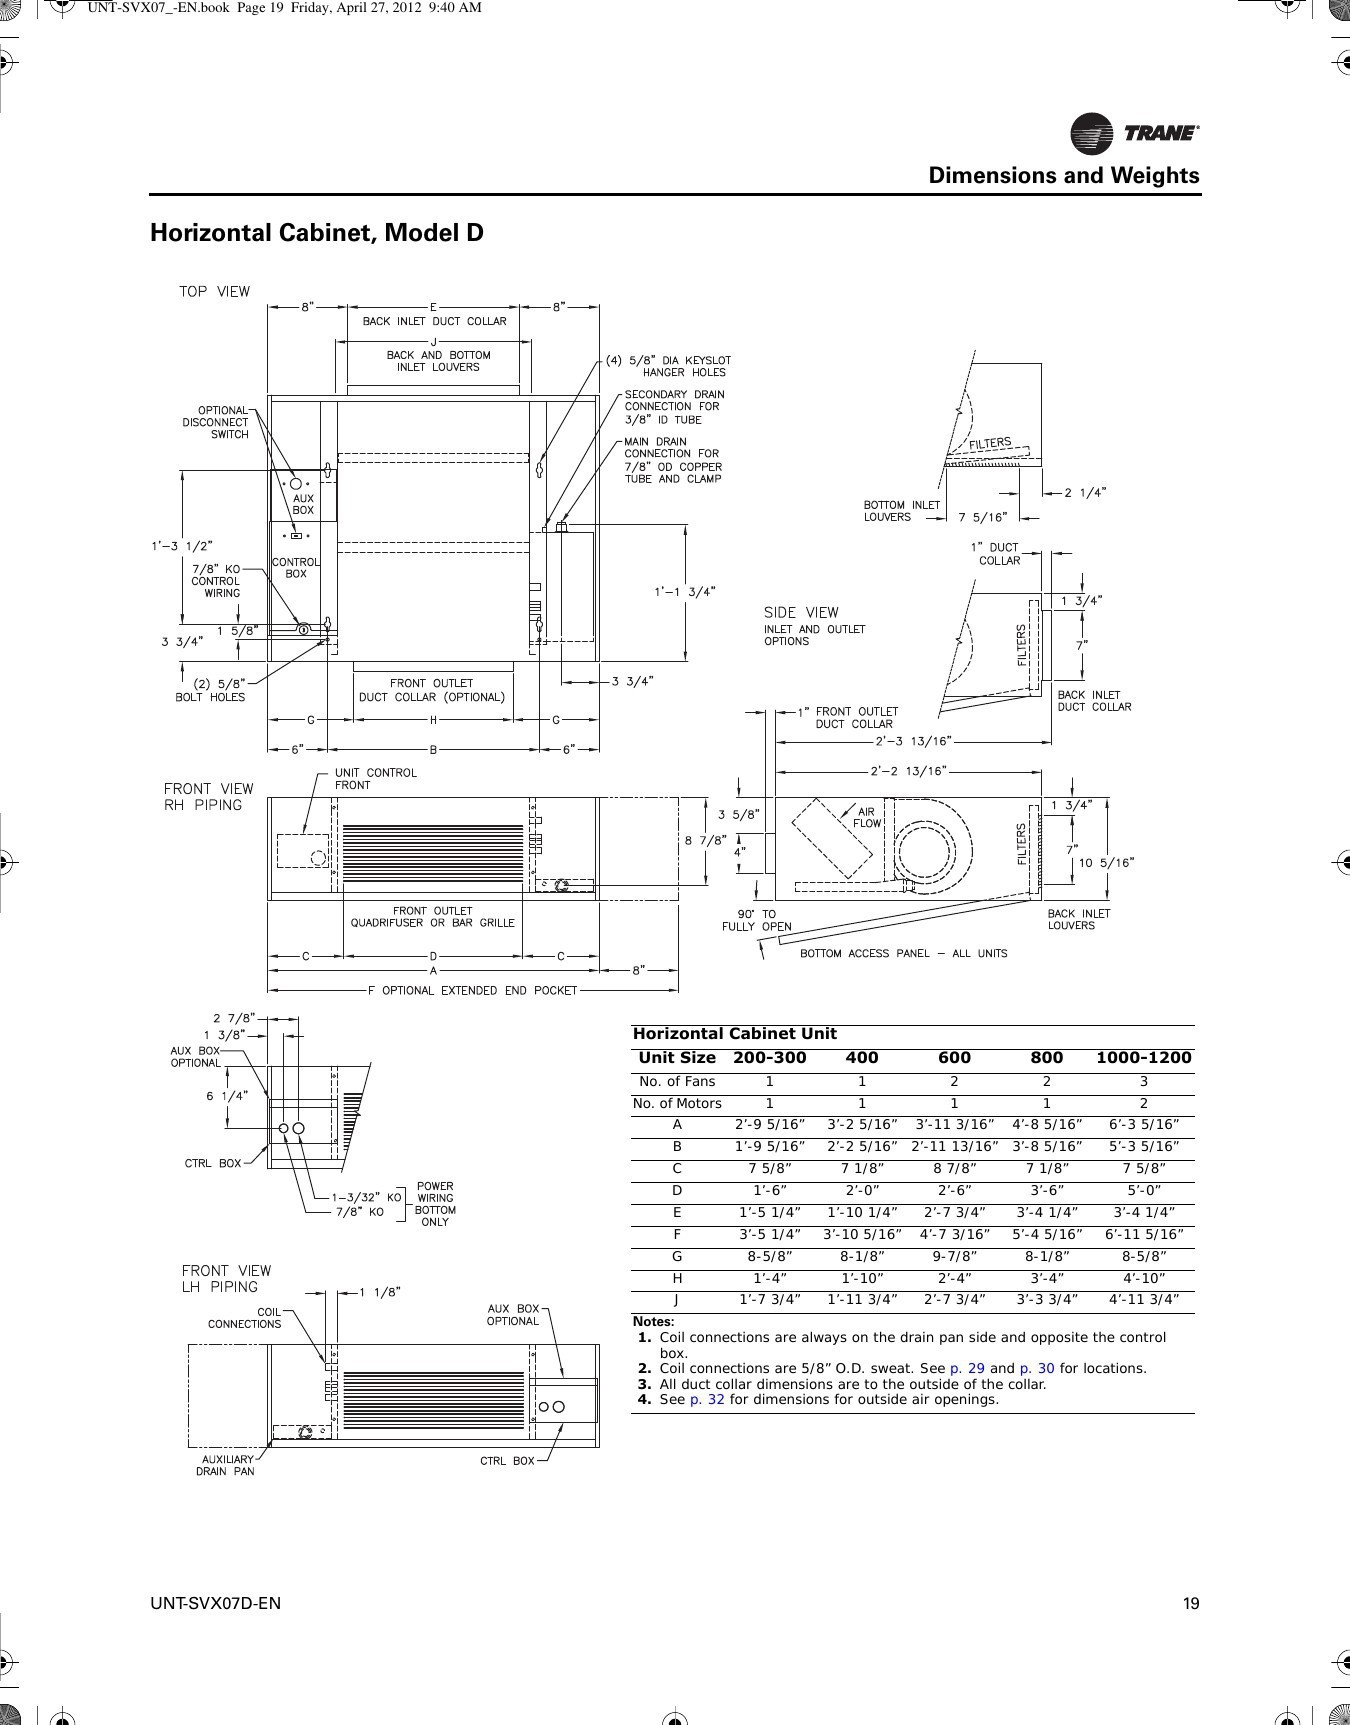 Trane Xl1200 Heat Pump Wiring Diagram Trane Xl1200 Heat Pump ... on trane parts diagram, trane xe1000 diagram, 1995 sportster tach wiring diagram, trane heating wiring diagrams, trane condenser wiring-diagram, gas furnace wiring diagram, home furnace wiring diagram, trane xl80 wiring-diagram, trane furnace wiring, bryant 80 wiring diagram,